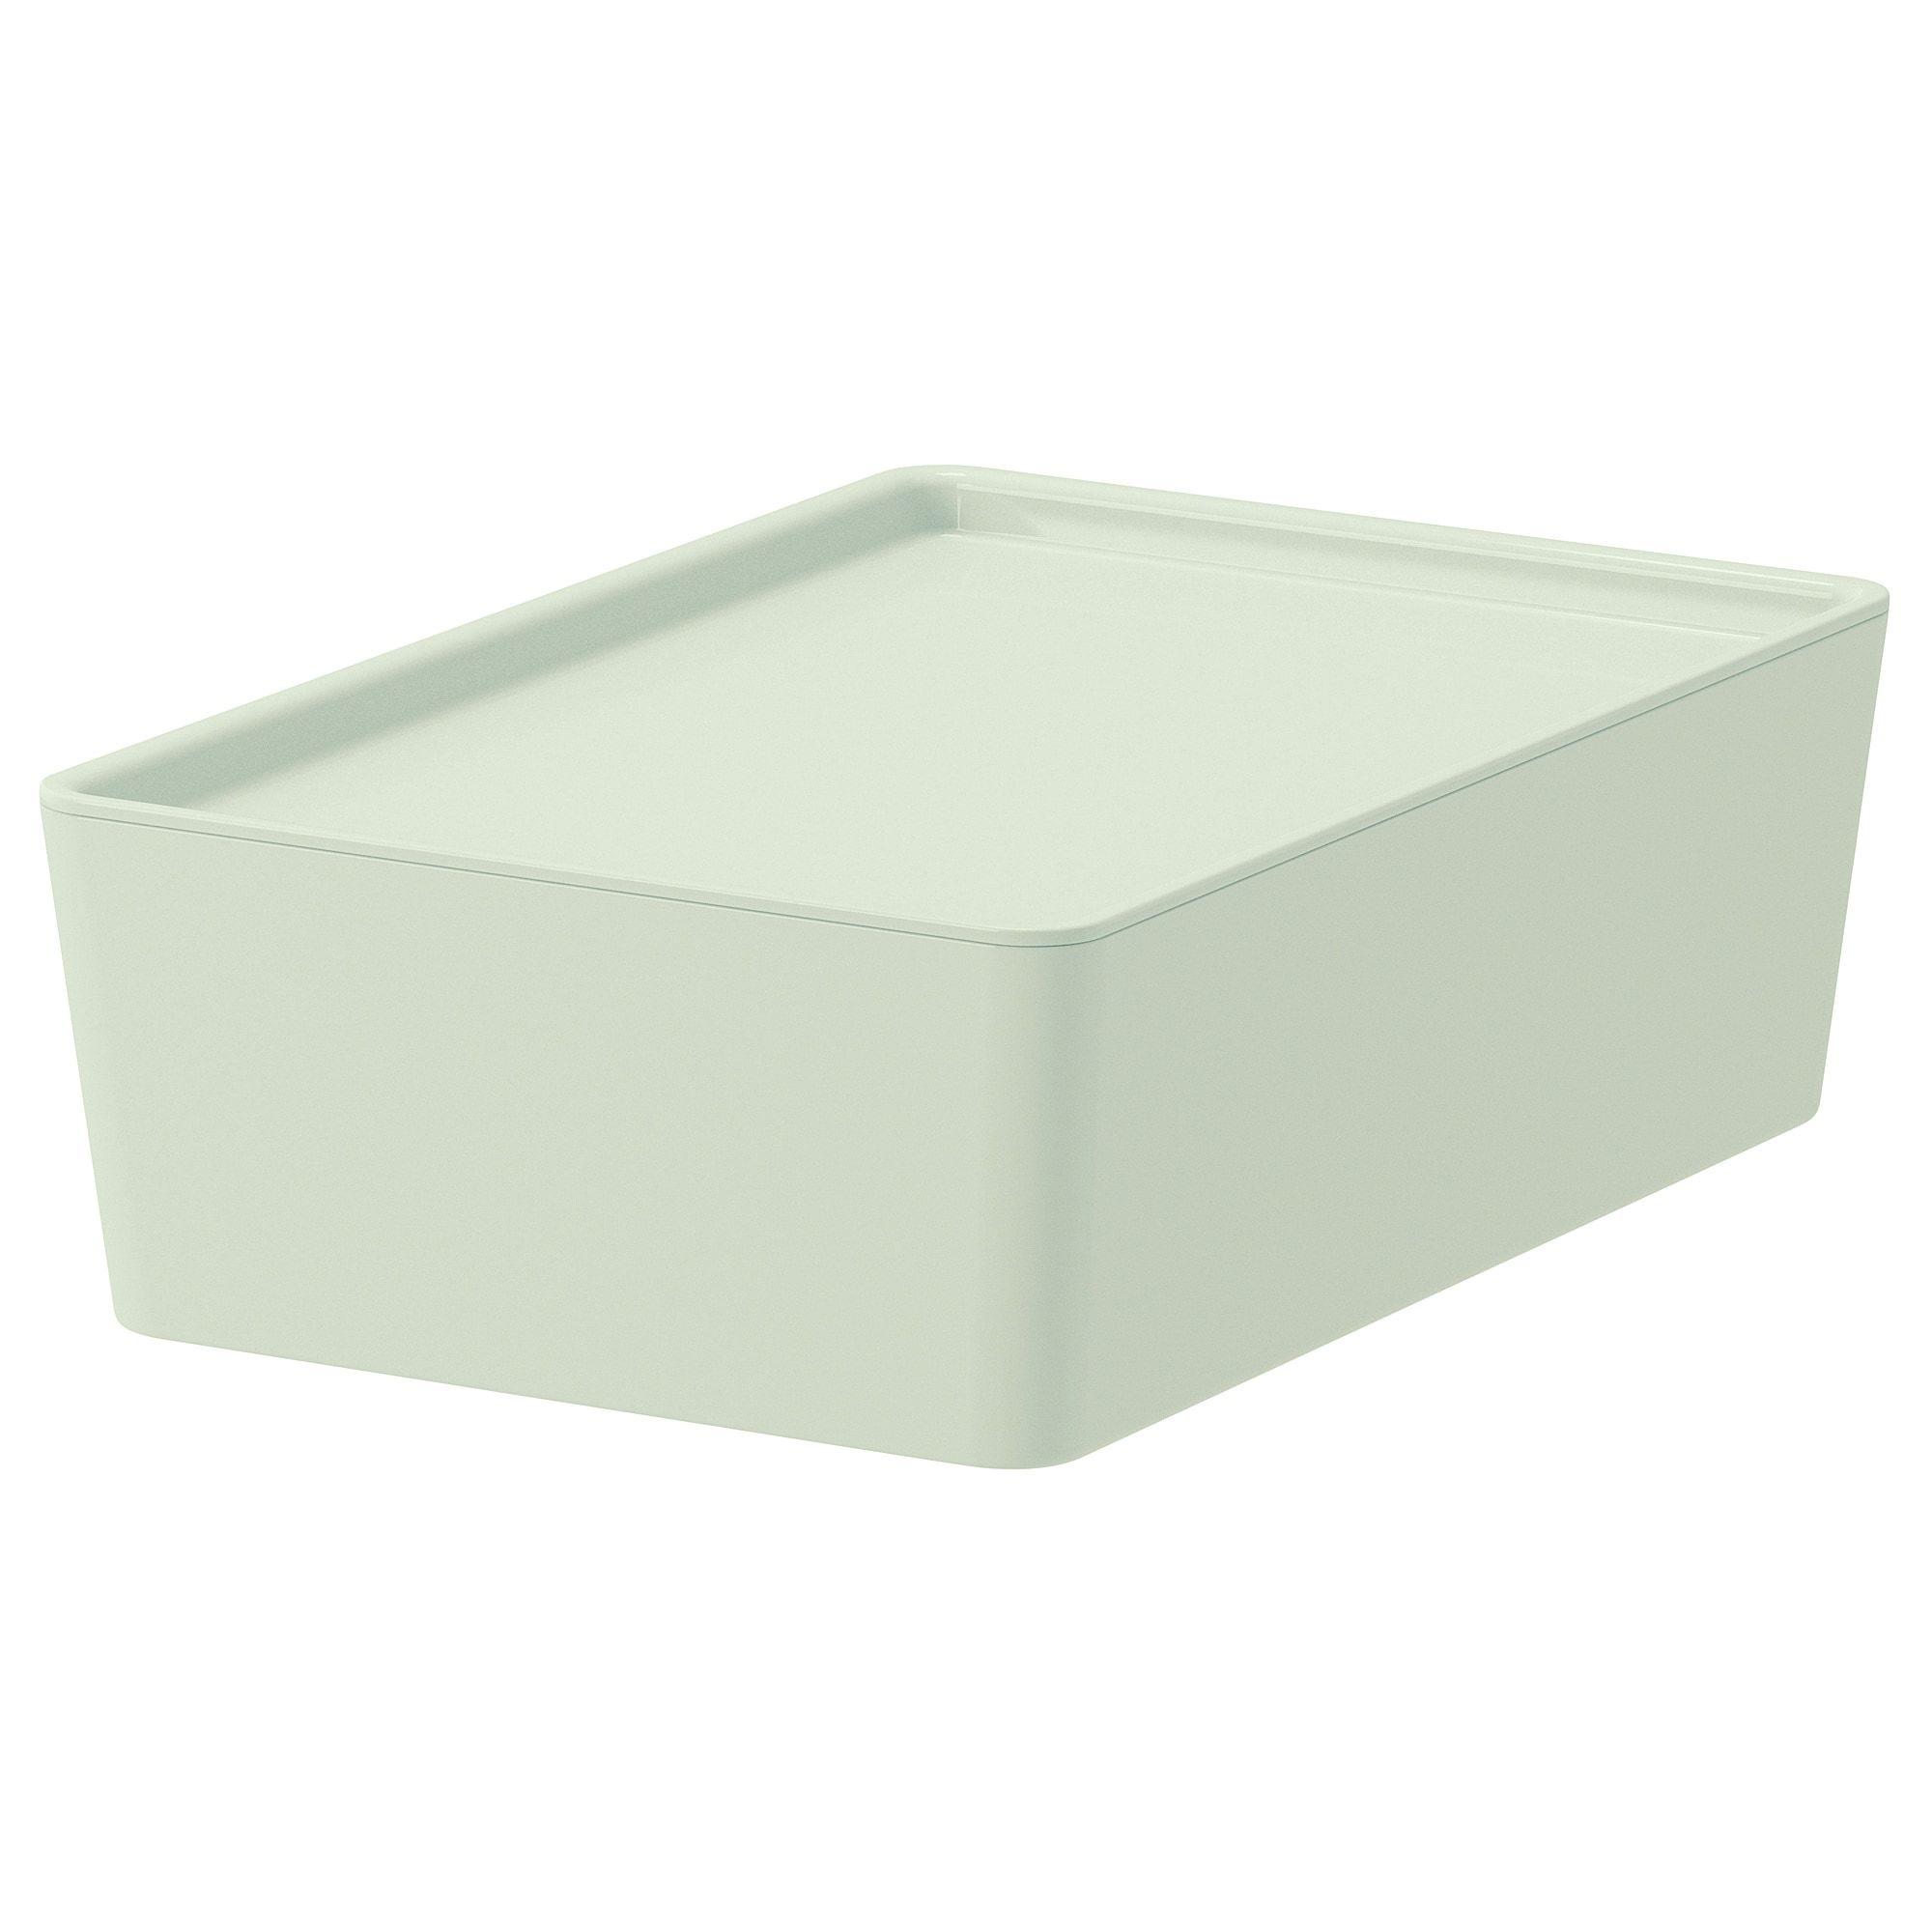 Ikea Kuggis Light Green Storage Box With Lid Storage Boxes With Lids Card Storage Storage Boxes